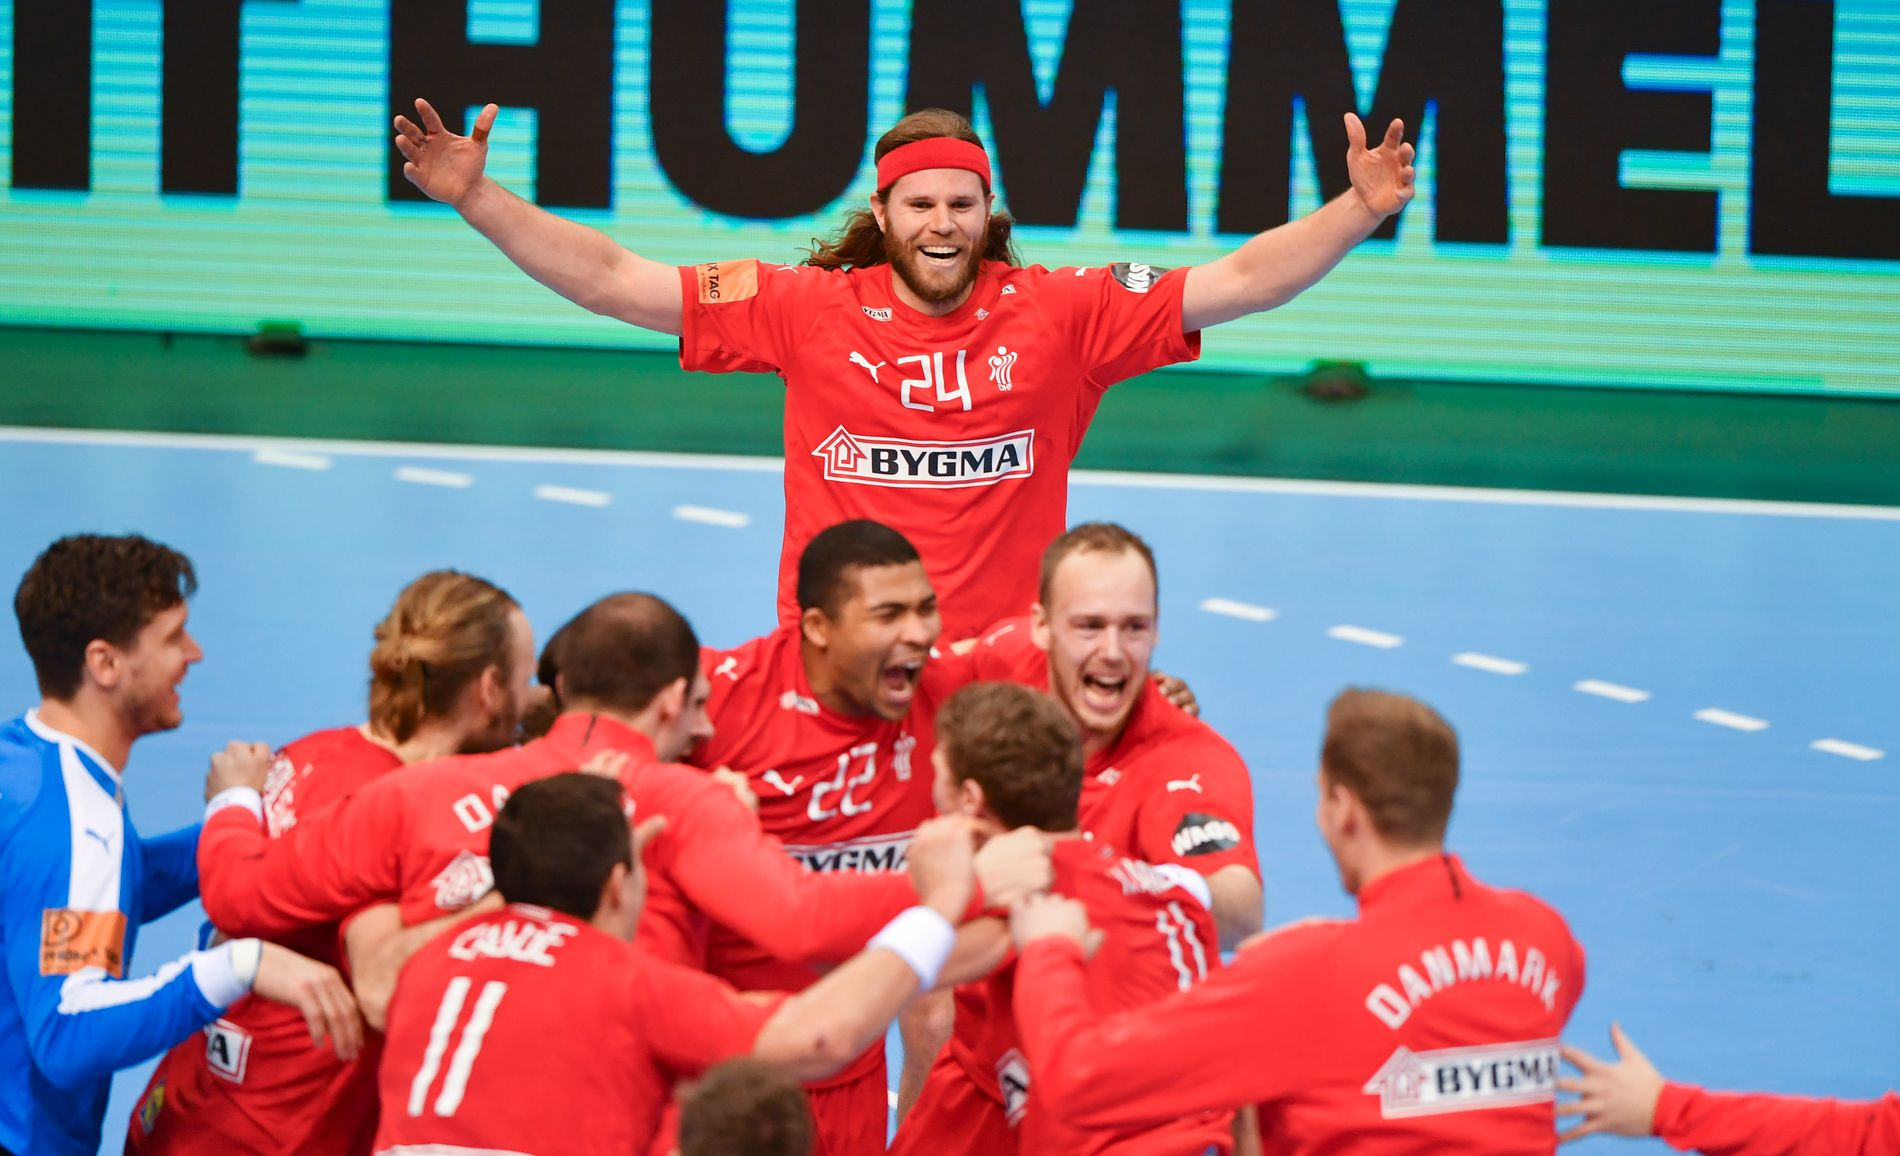 nordisk landskamp friidrett 2020